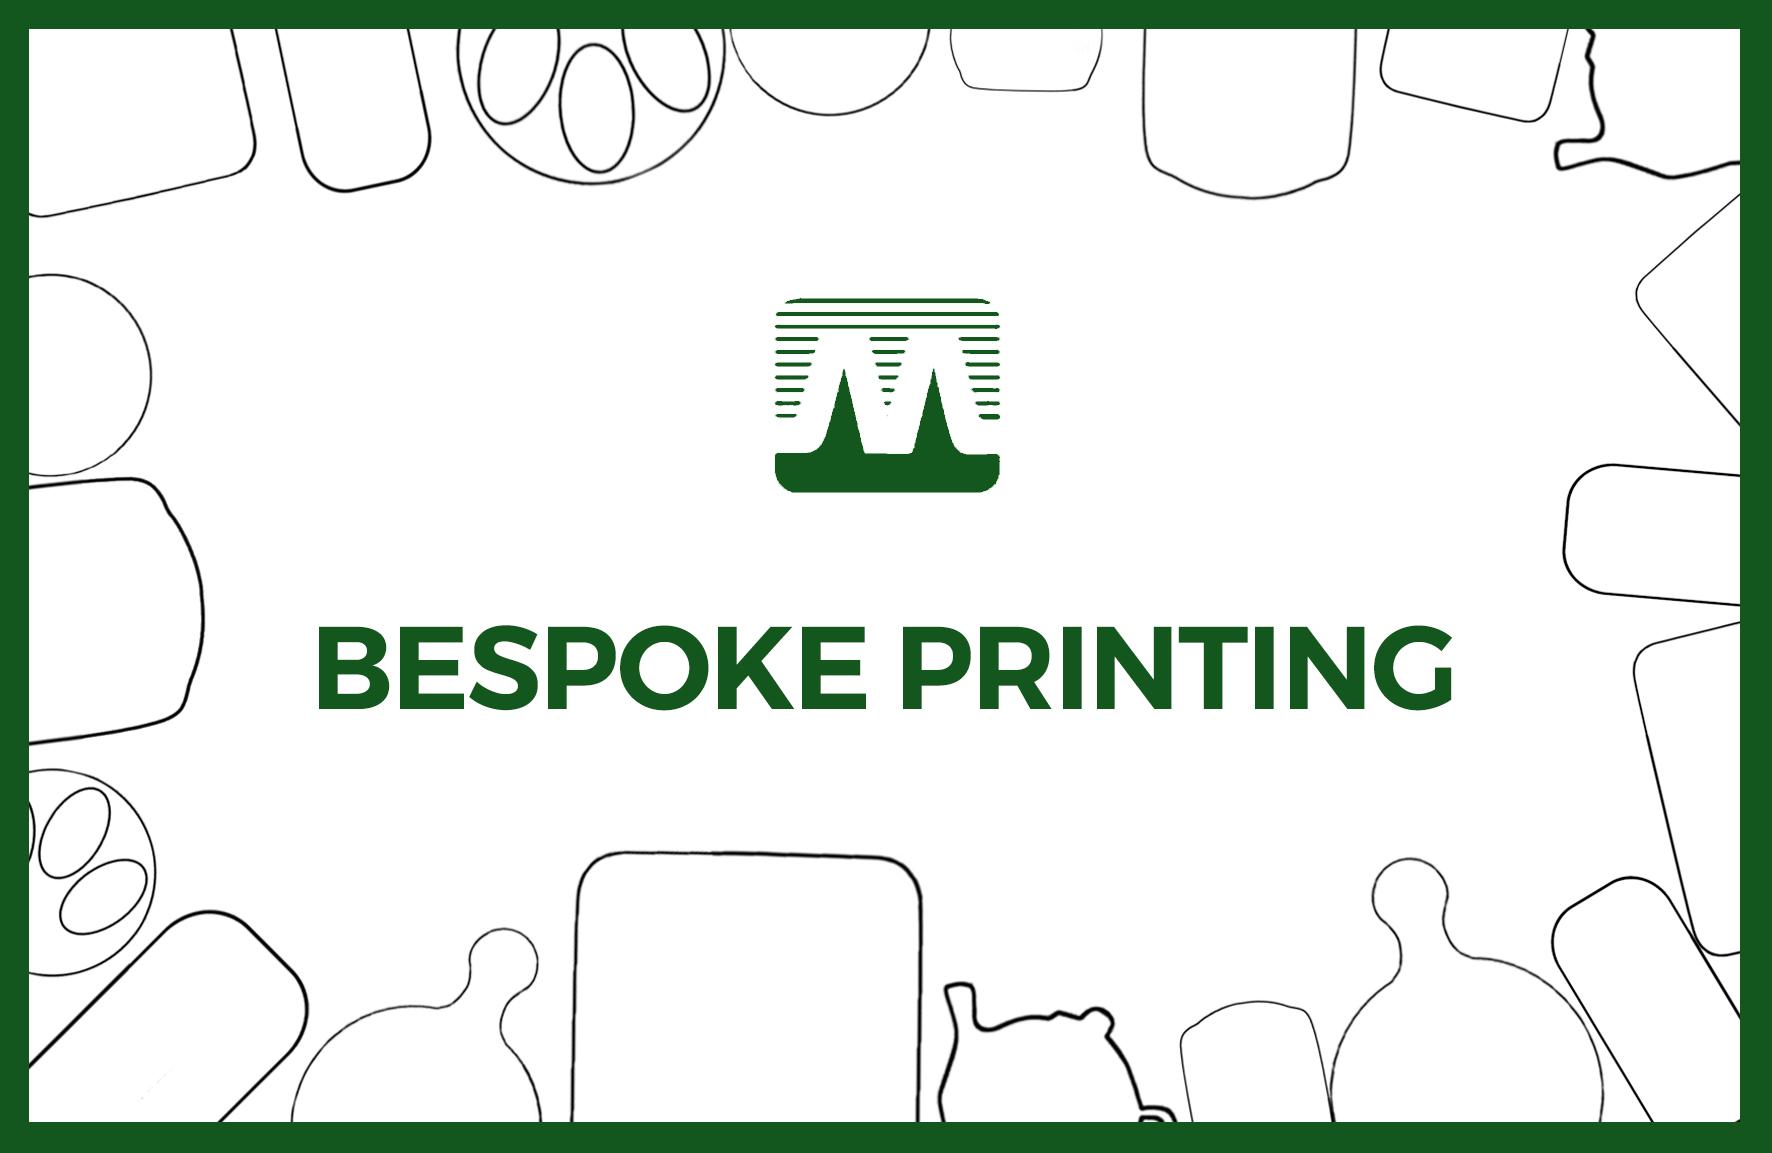 bespoke printing with melamaster blog image